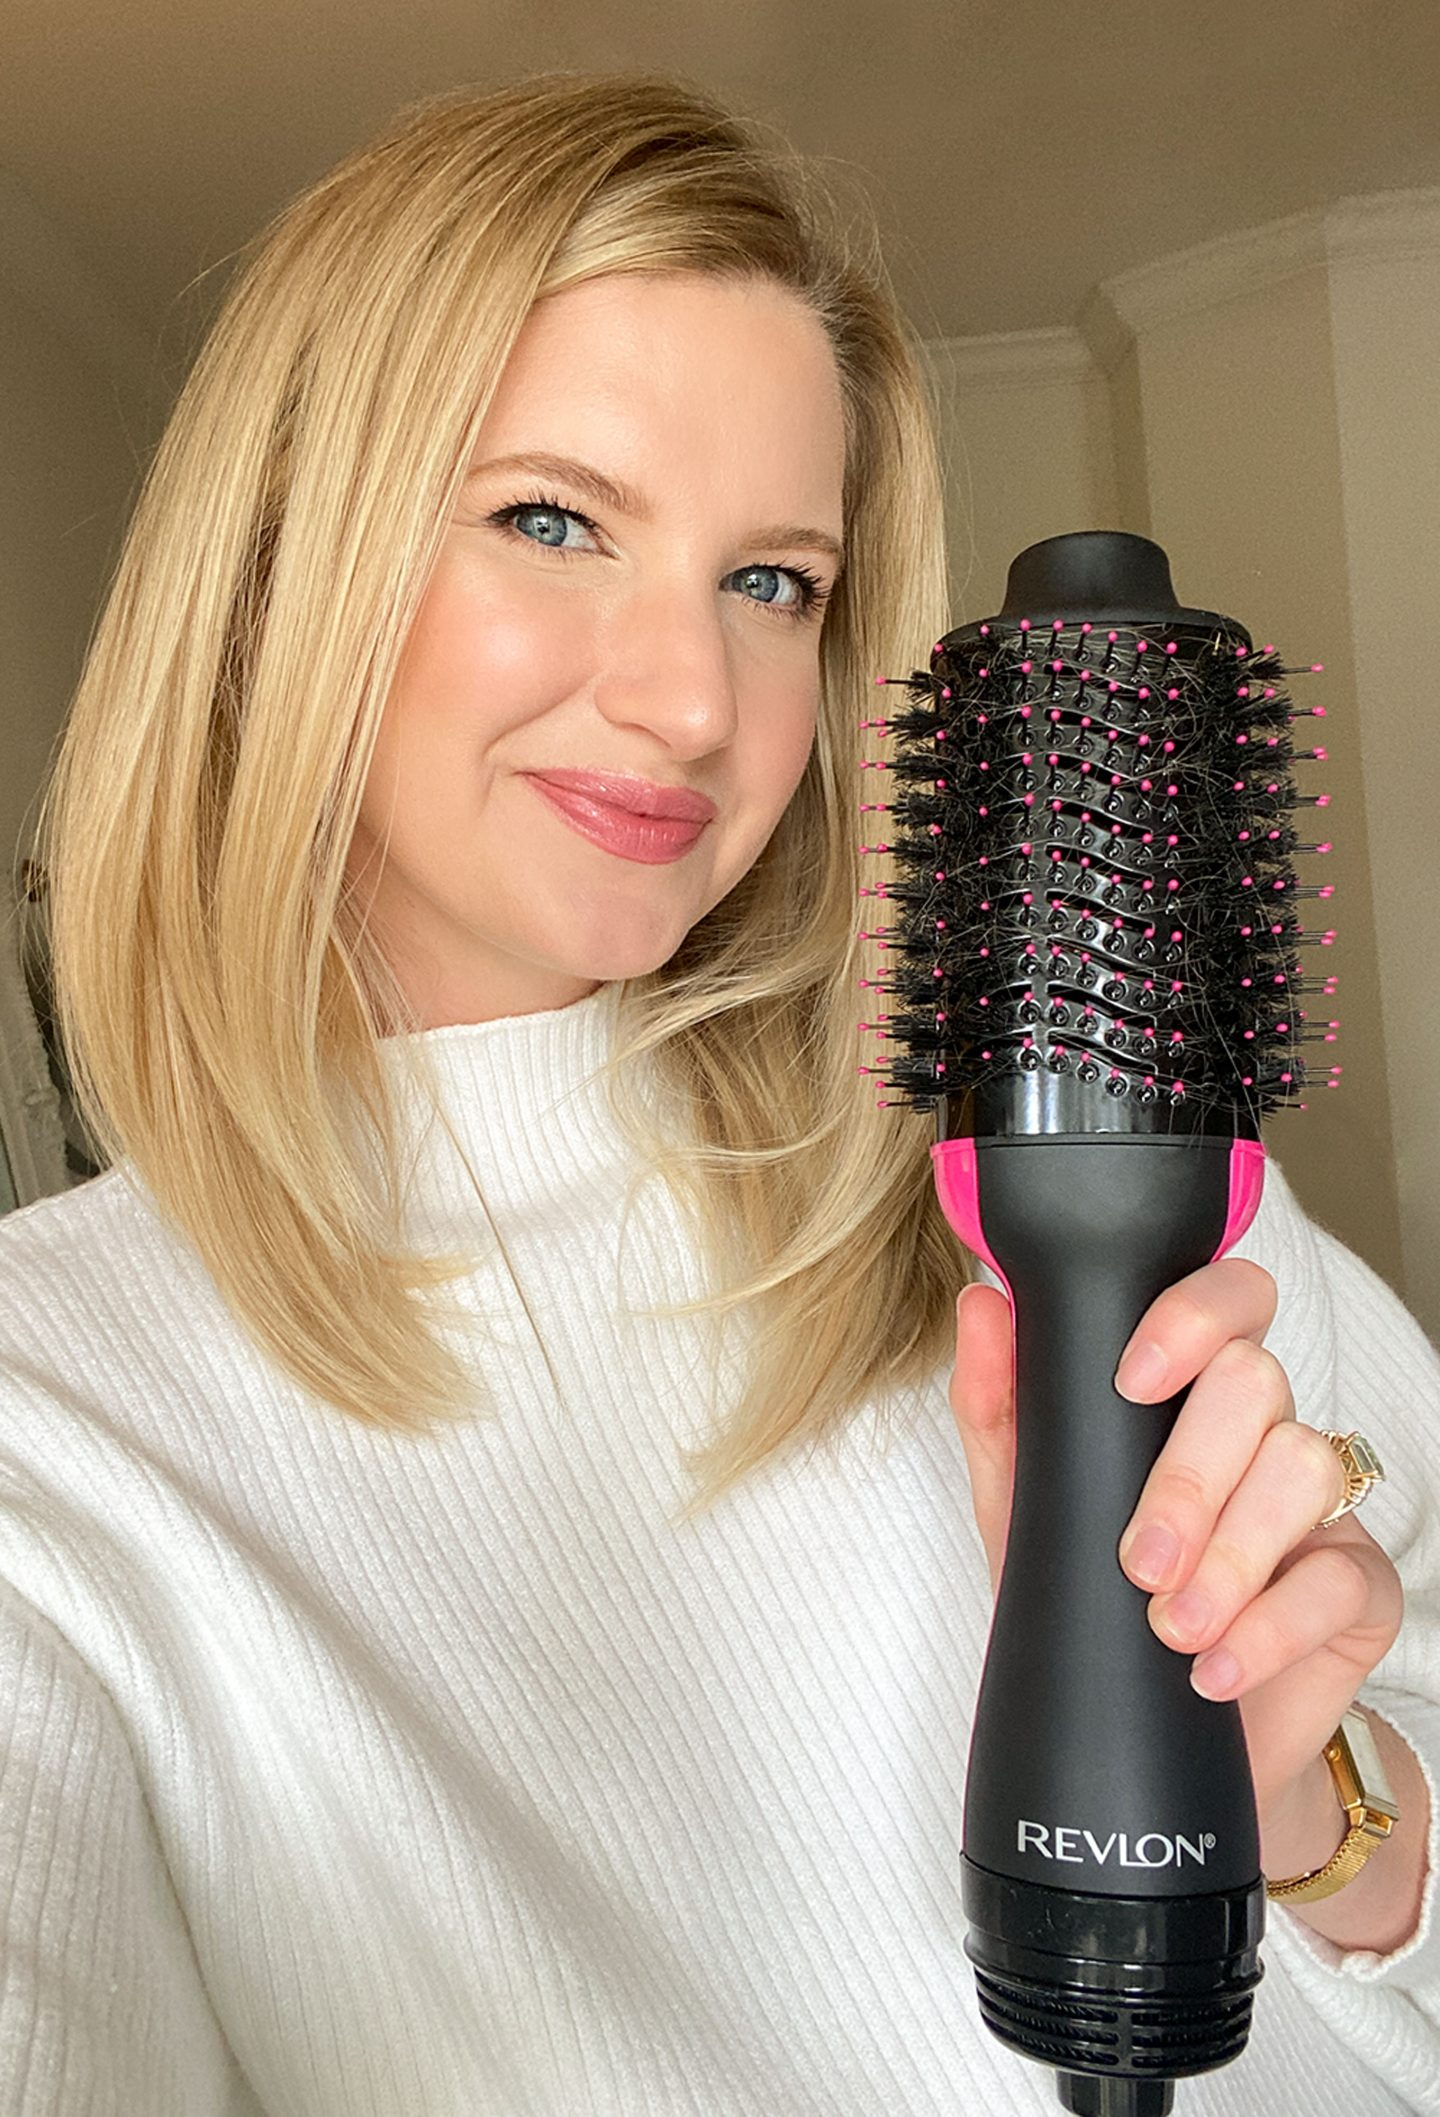 Revlon Salon One-Step Hair Dryer and Volumizer Review